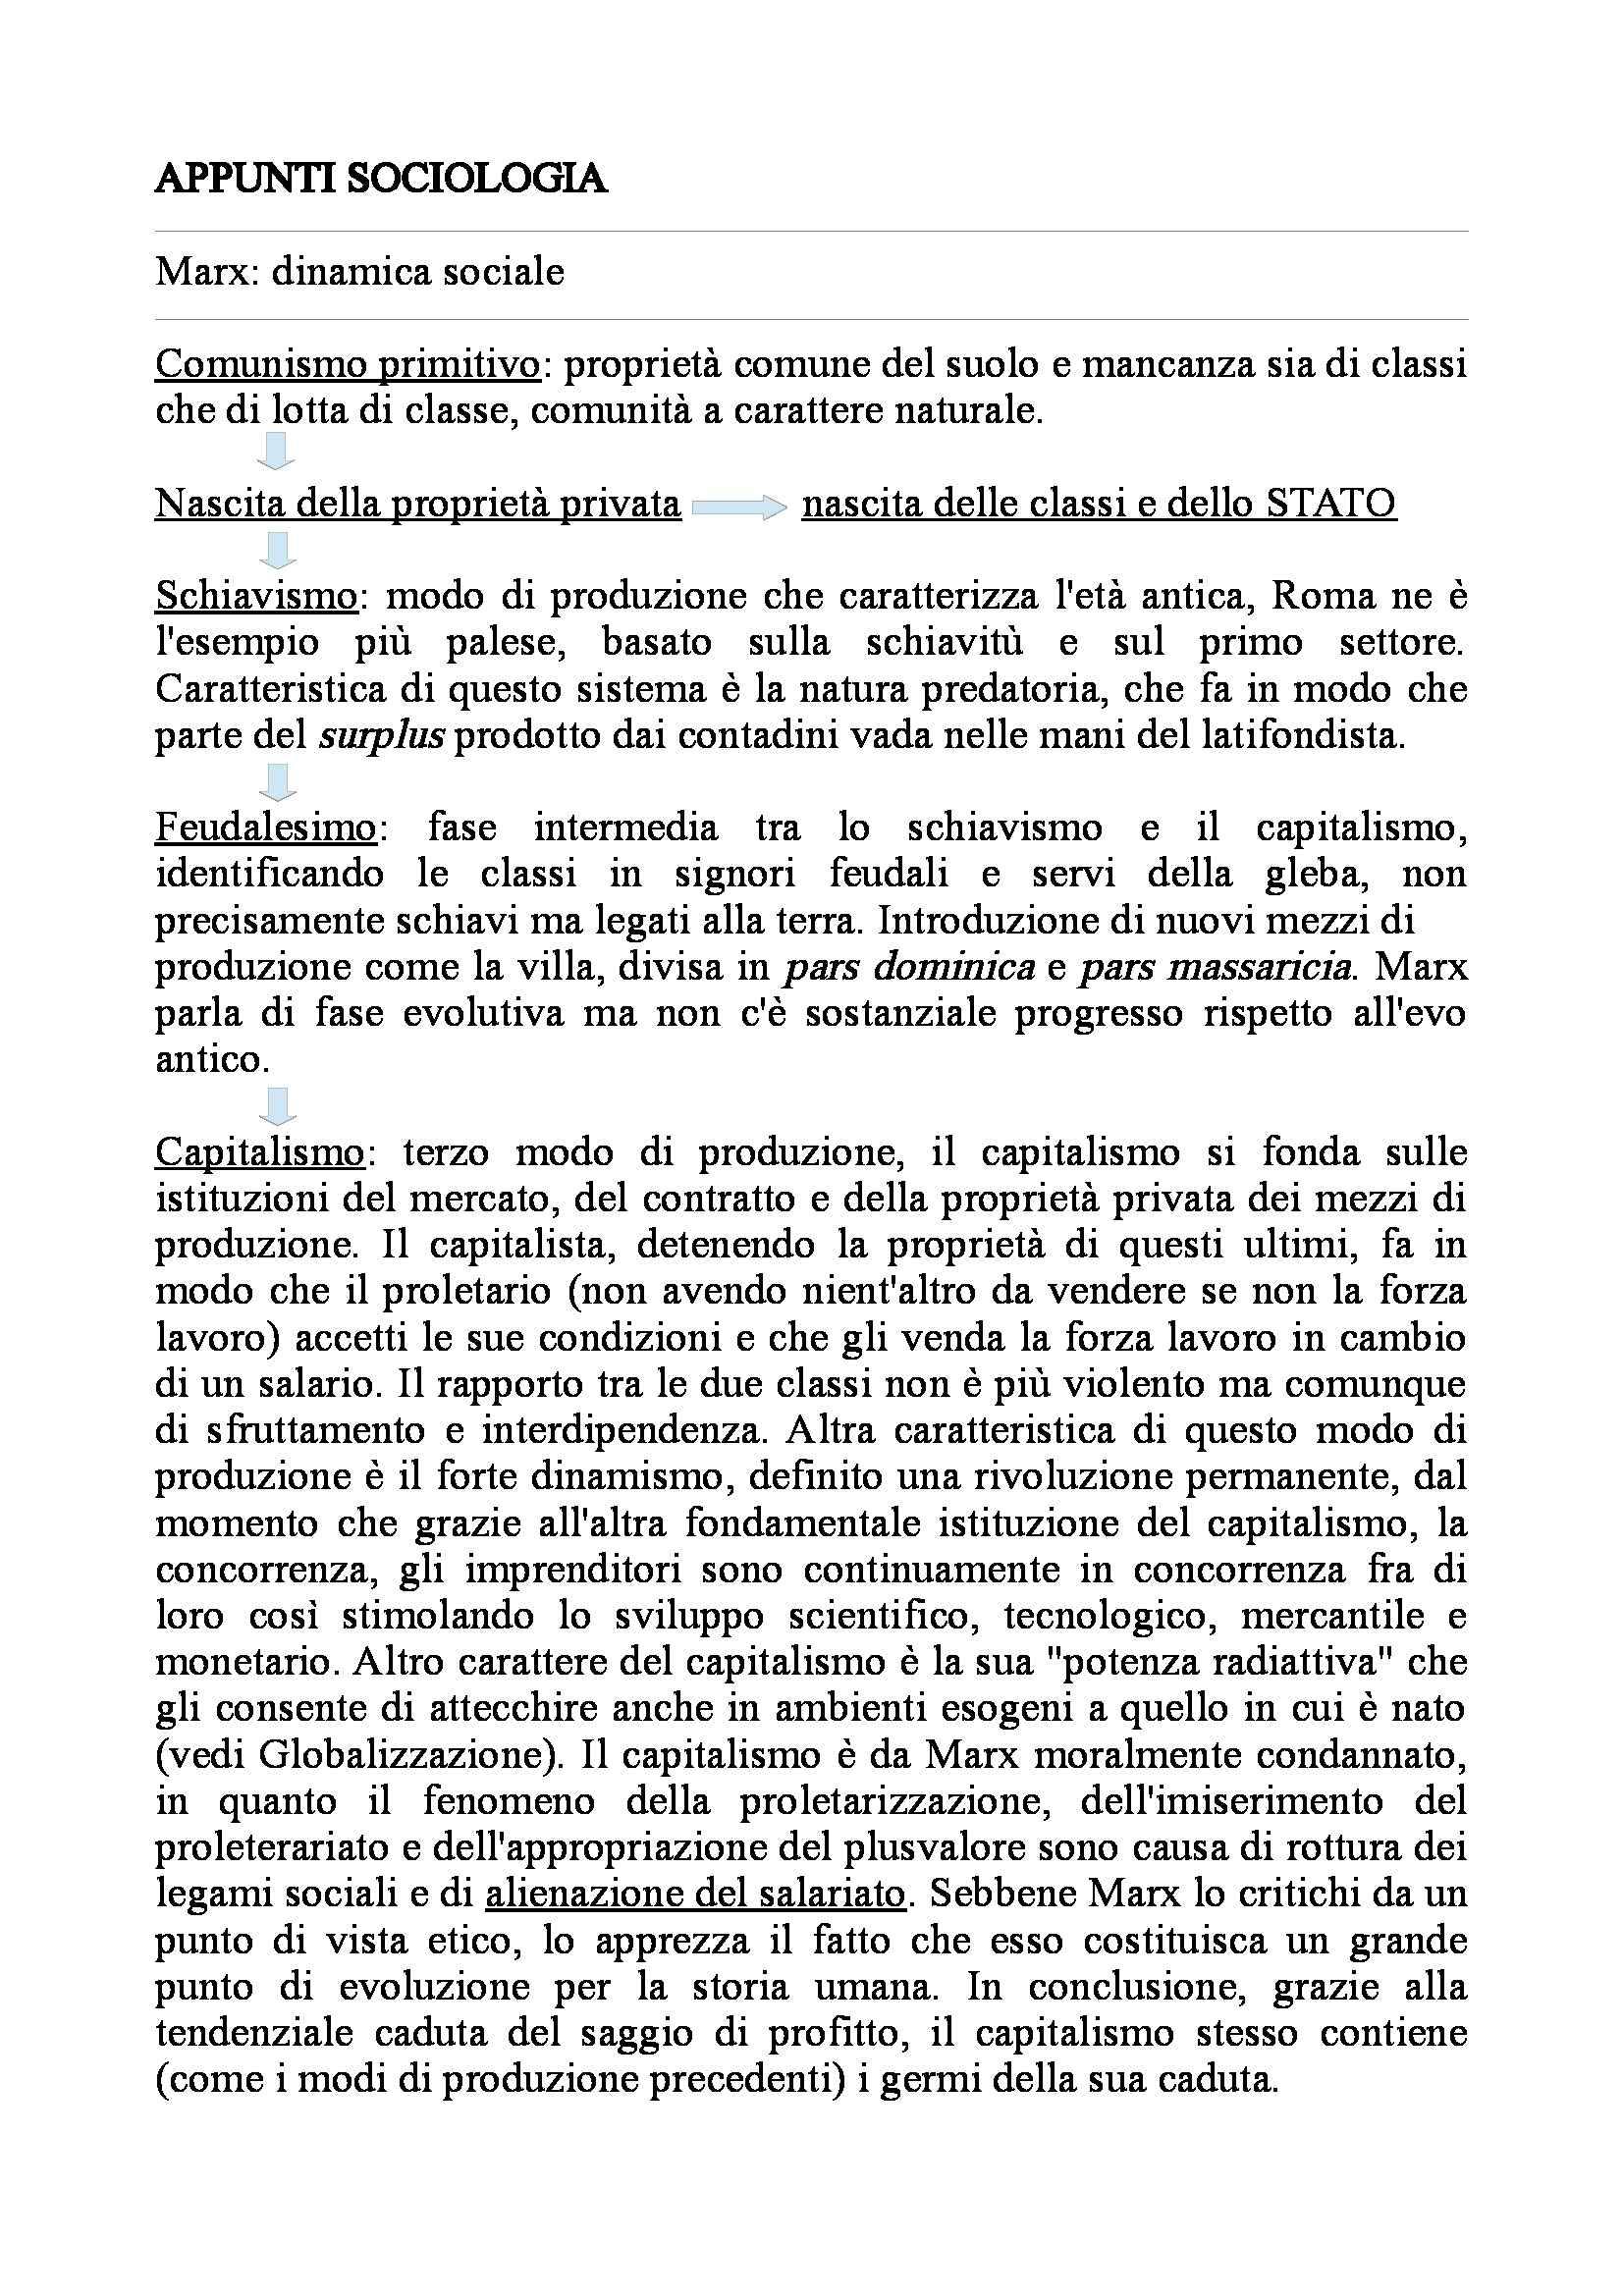 Sociologia generale  - Appunti